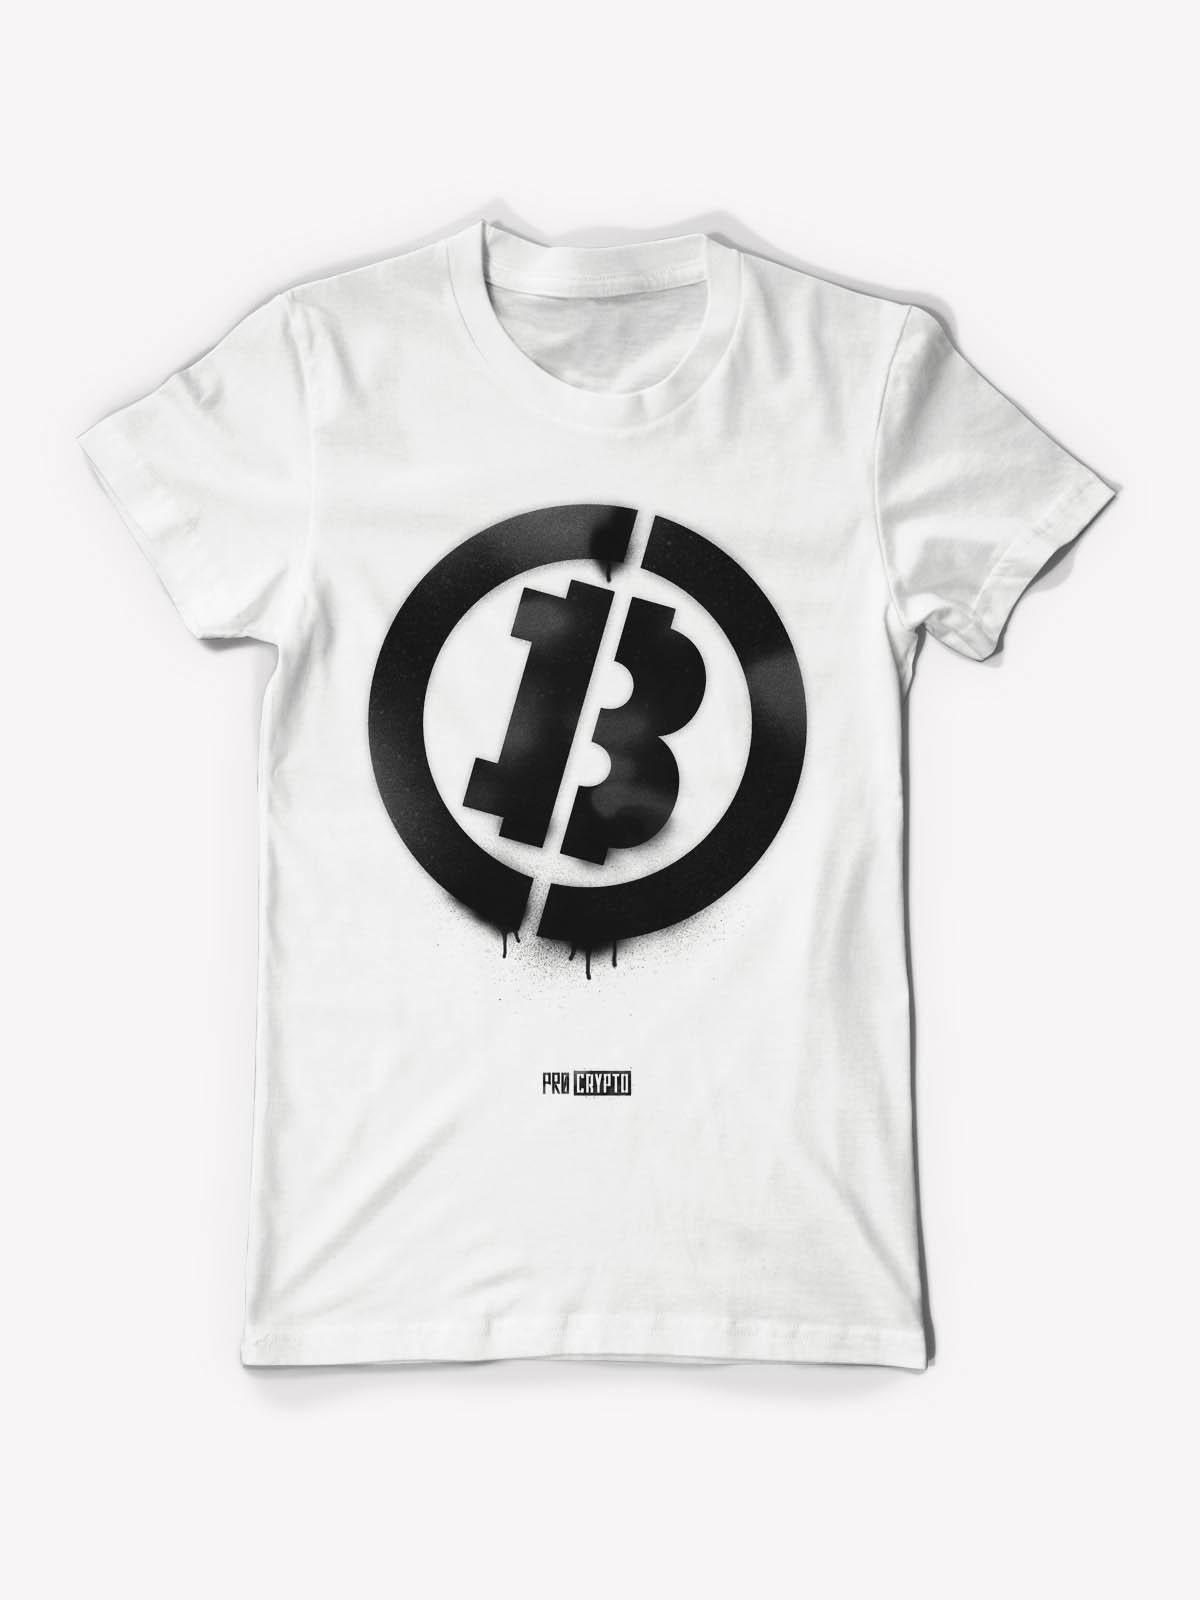 Bitcoin Stencil - White Tee